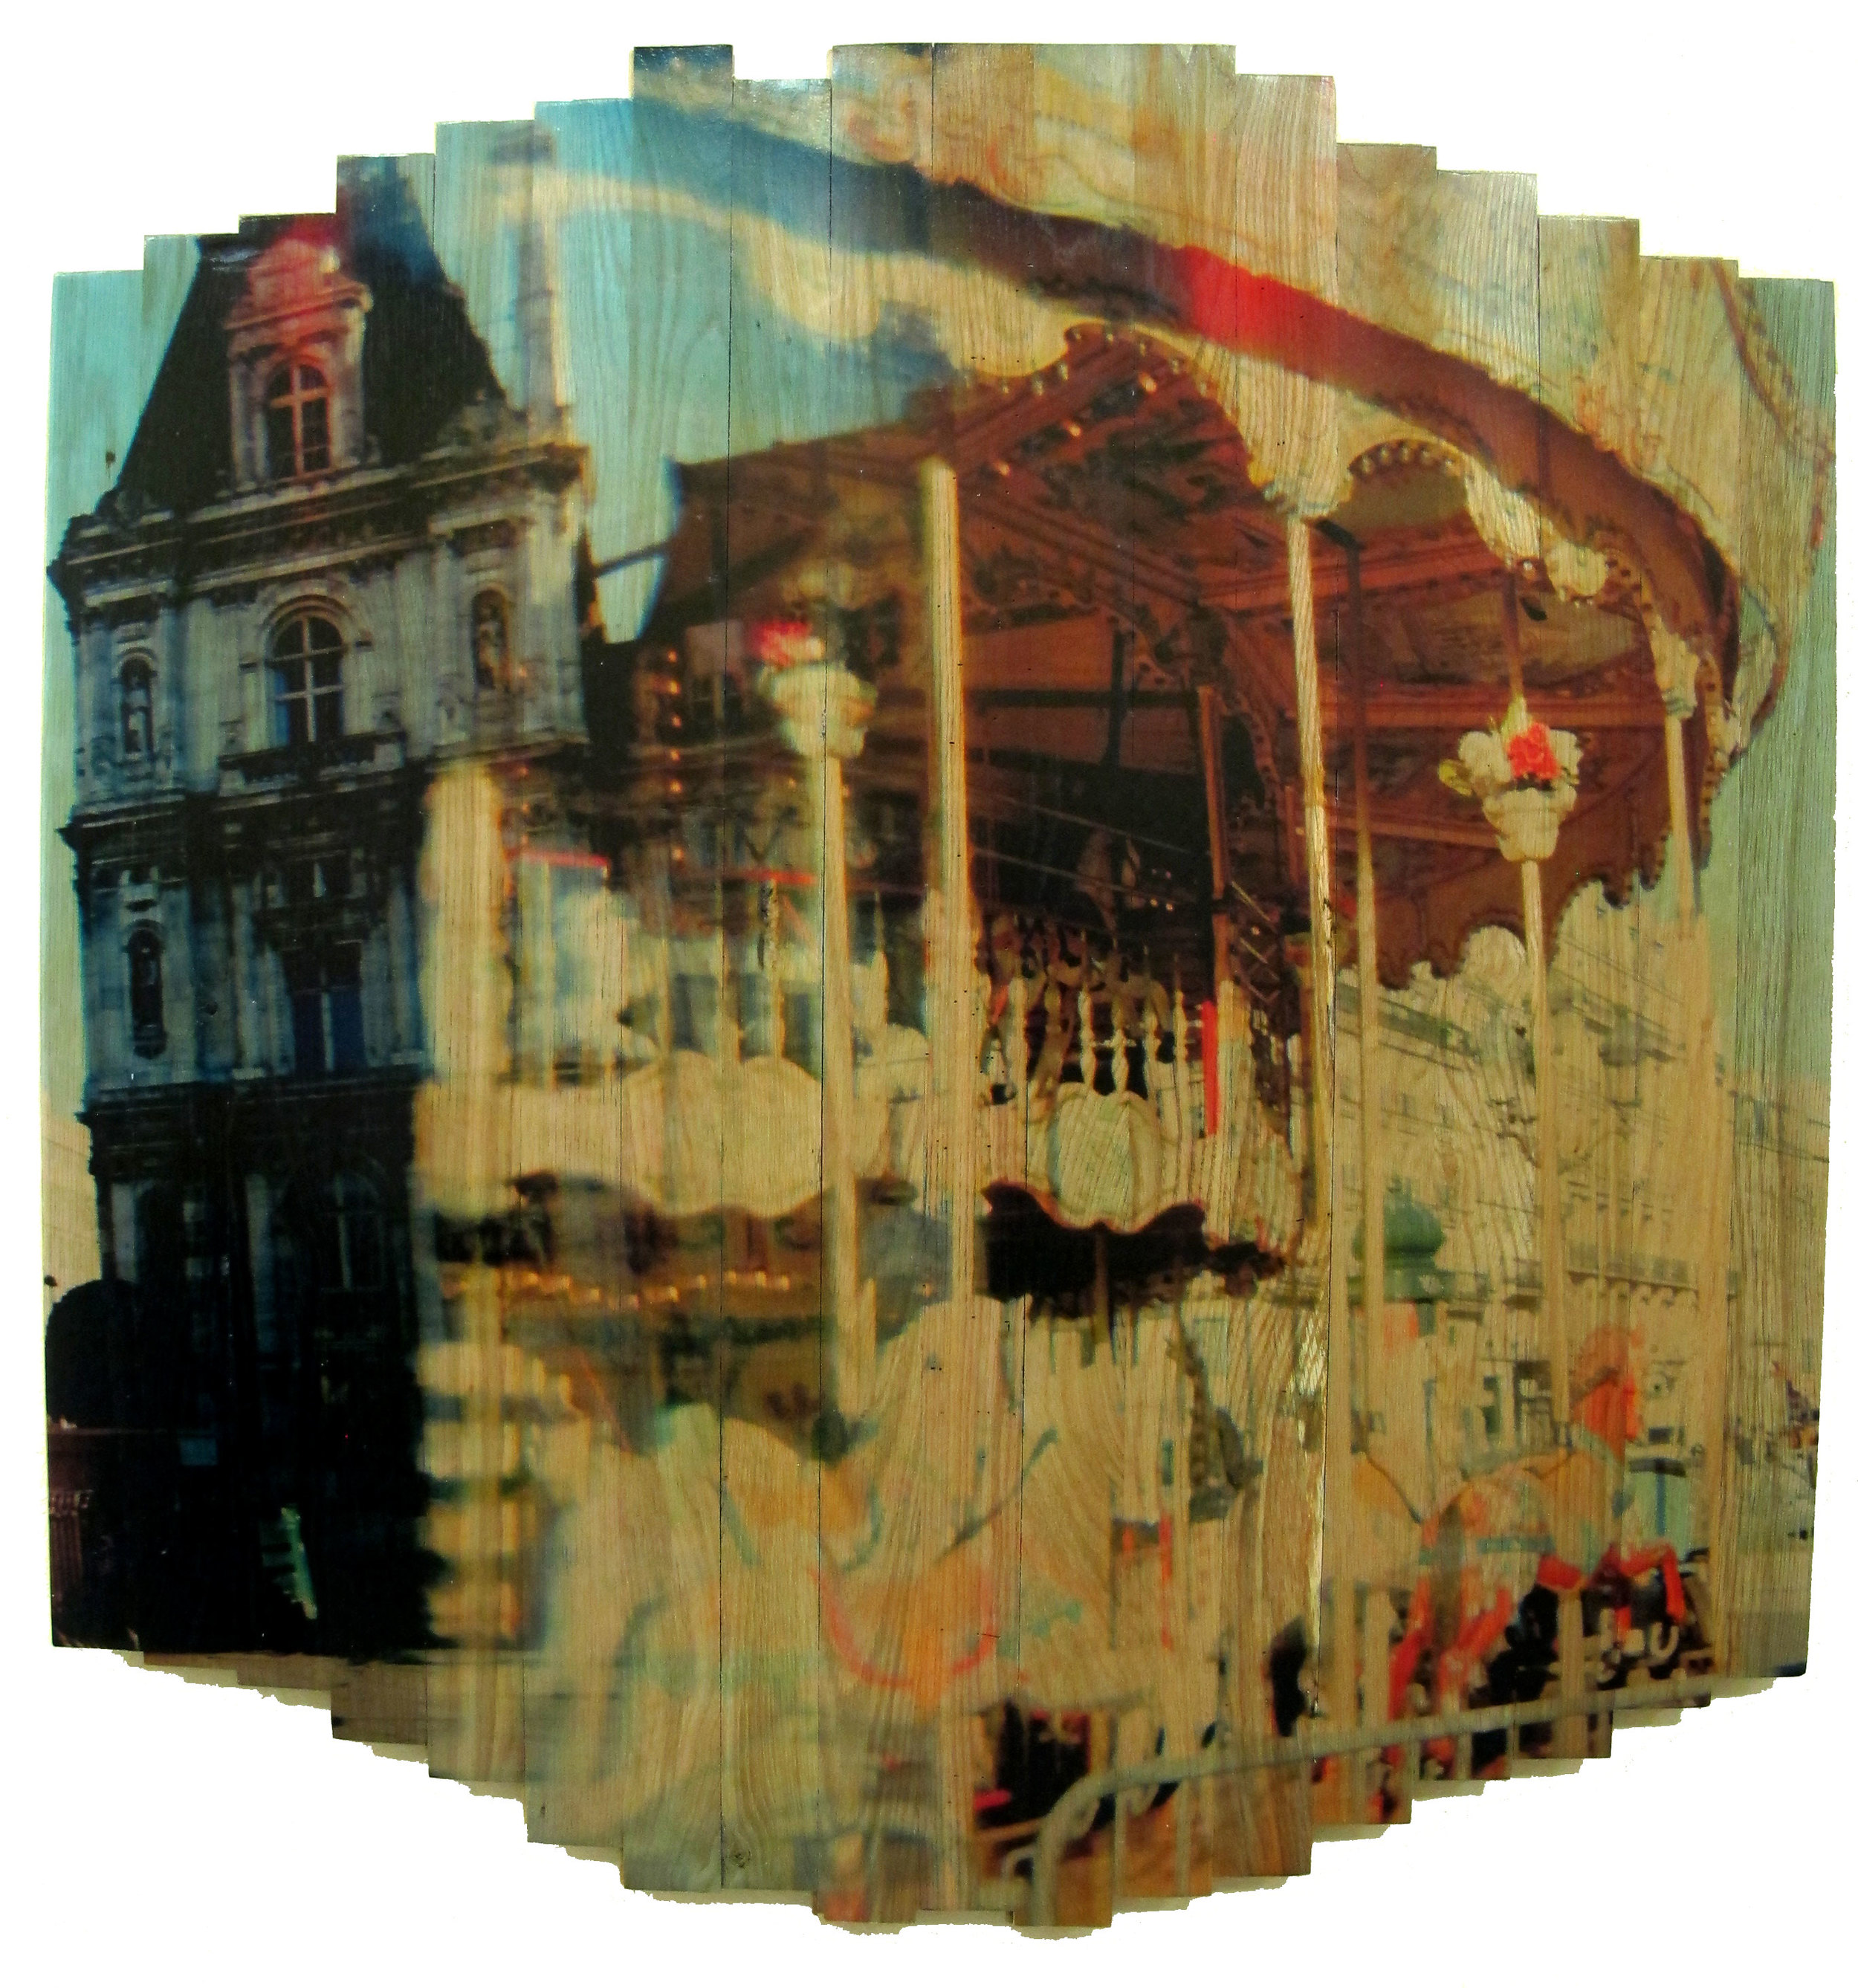 Paris Carousel II , 2016 c print on reclaimed wood floor 46 x 41 x 1.5 in / 117x105x4 cm  Unique